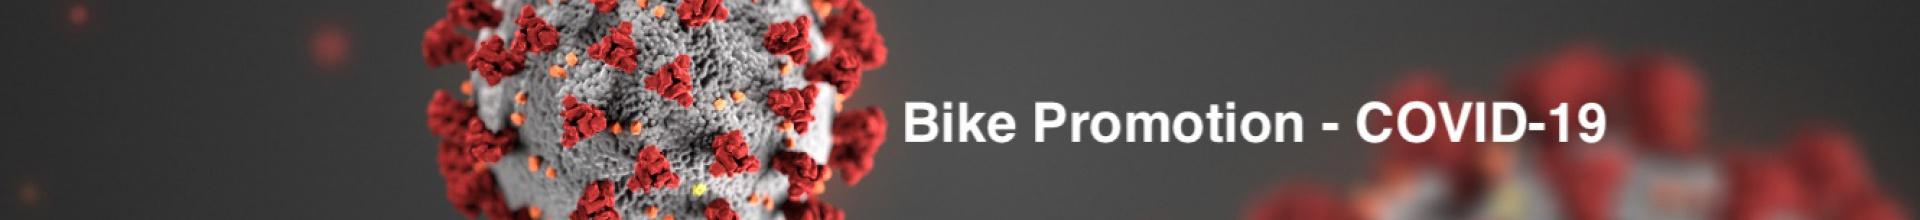 Bike Promotion - COVID-19